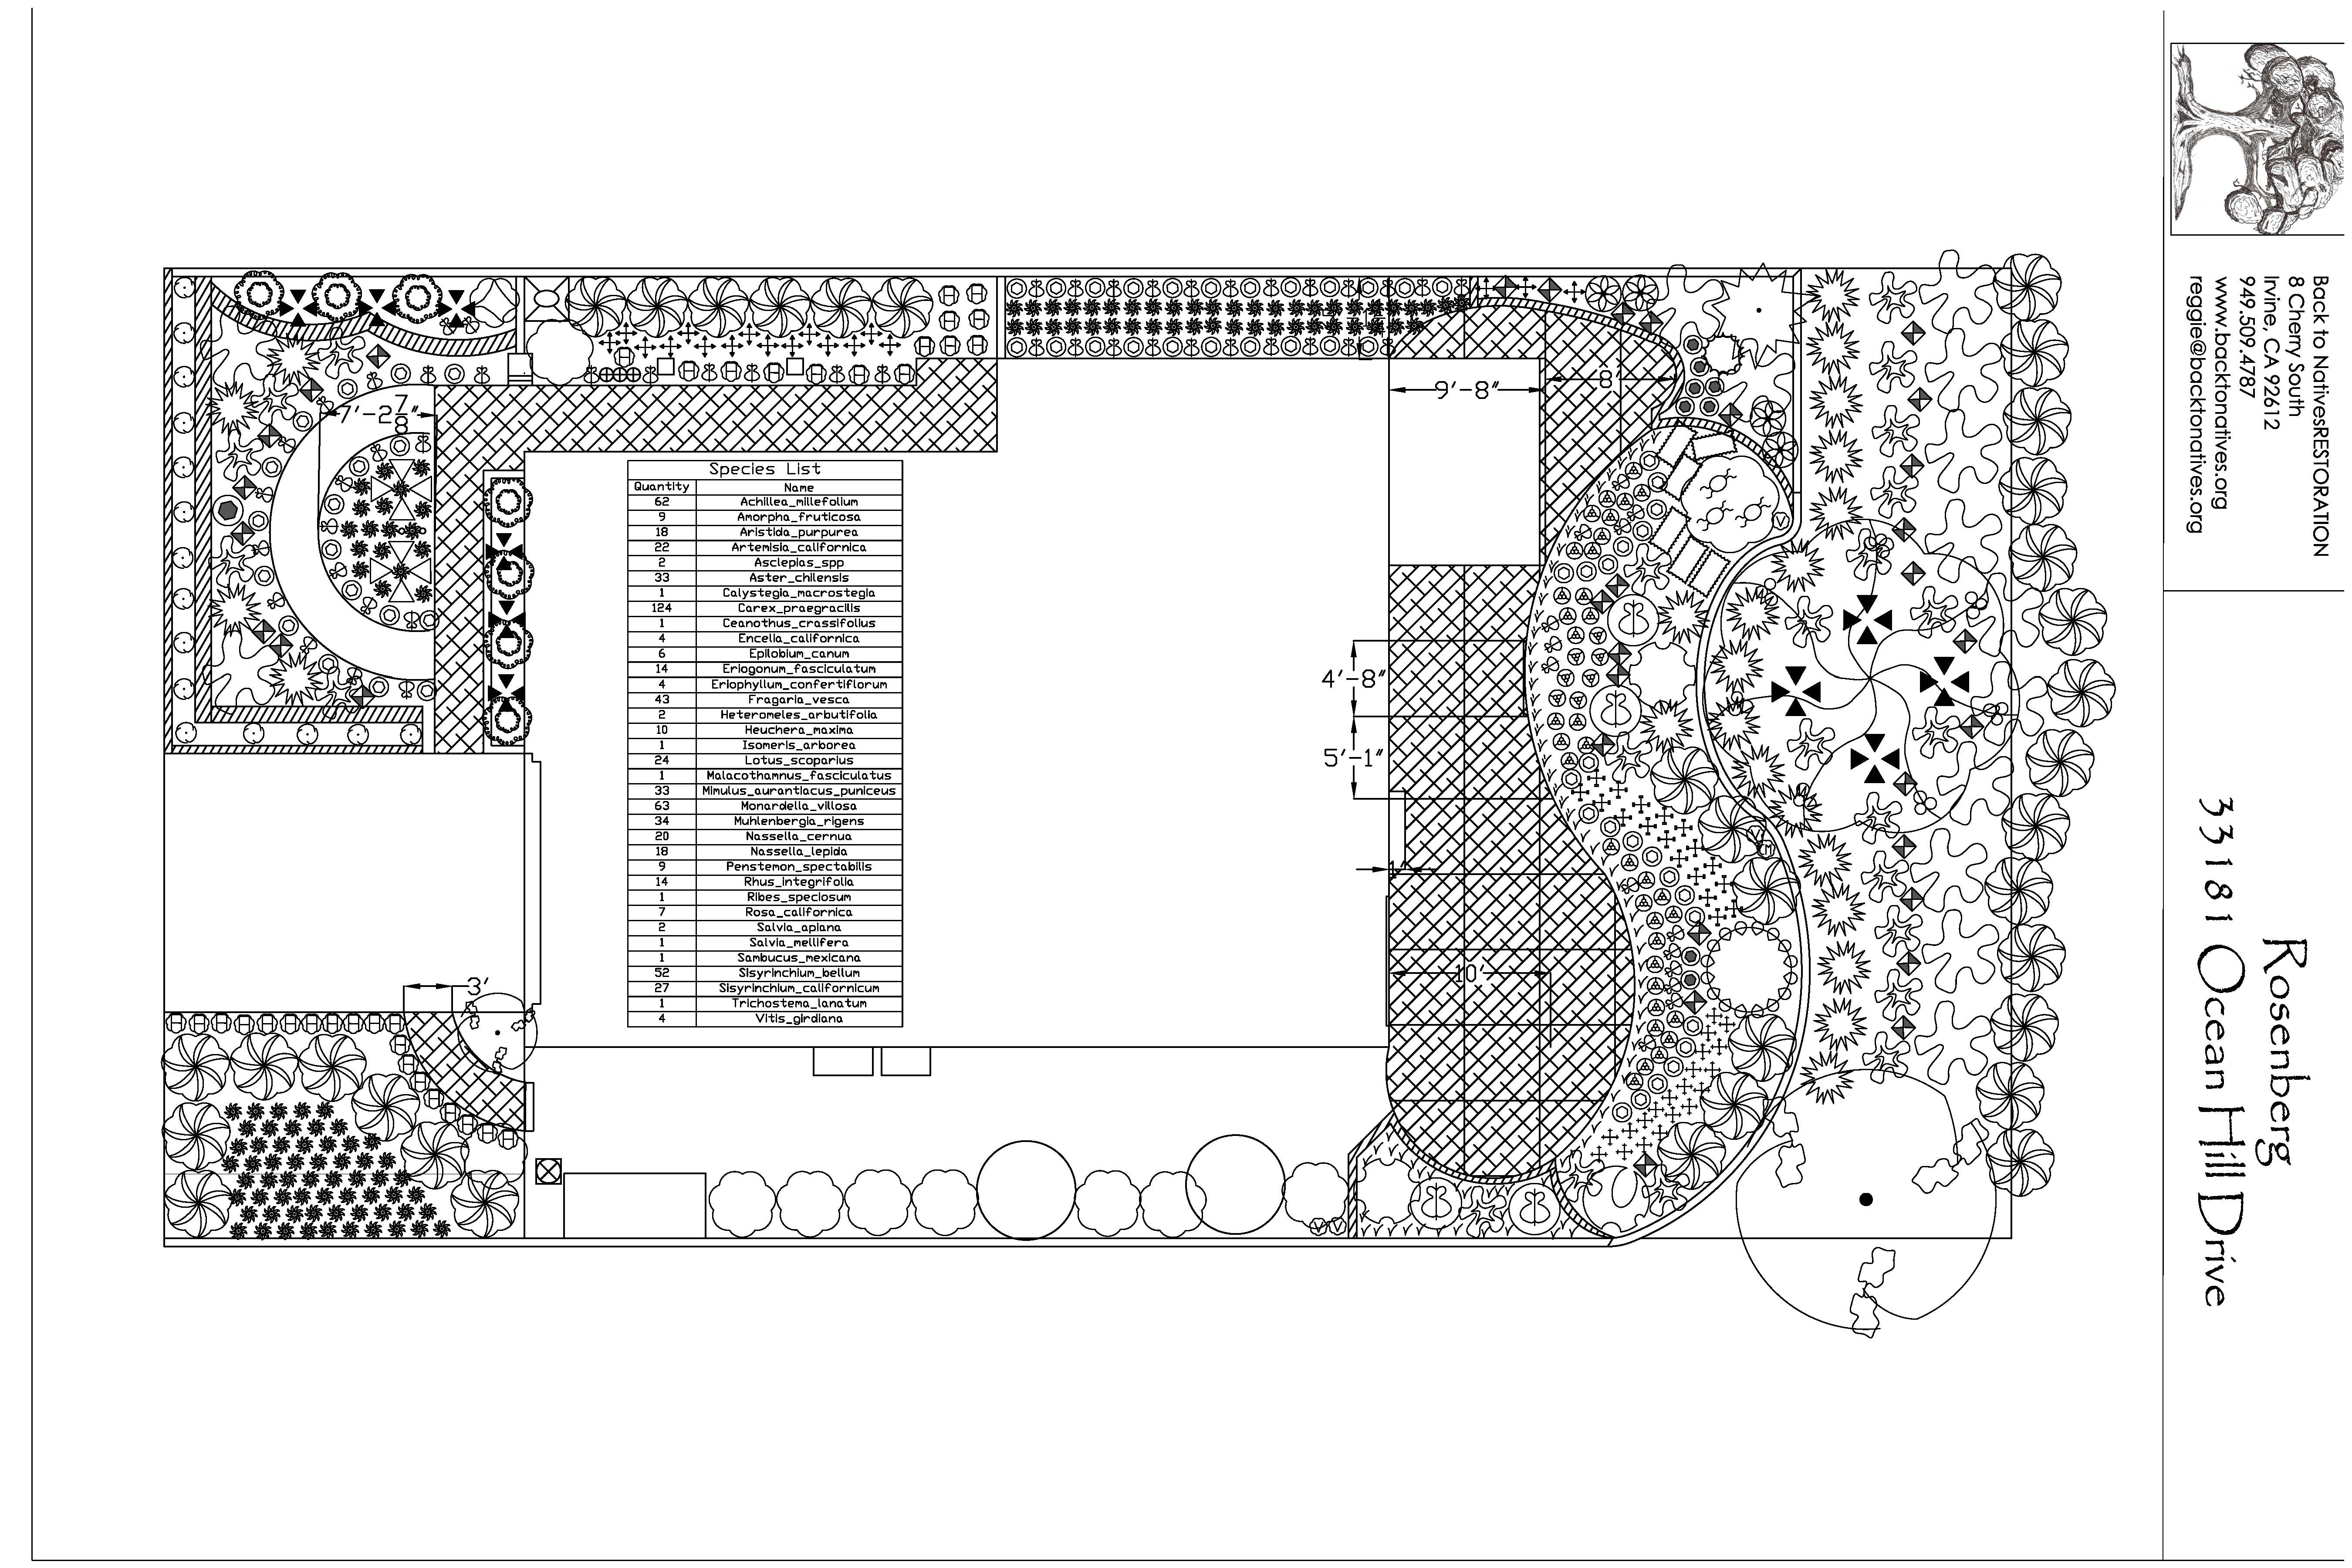 Landscape Design Services Deposit